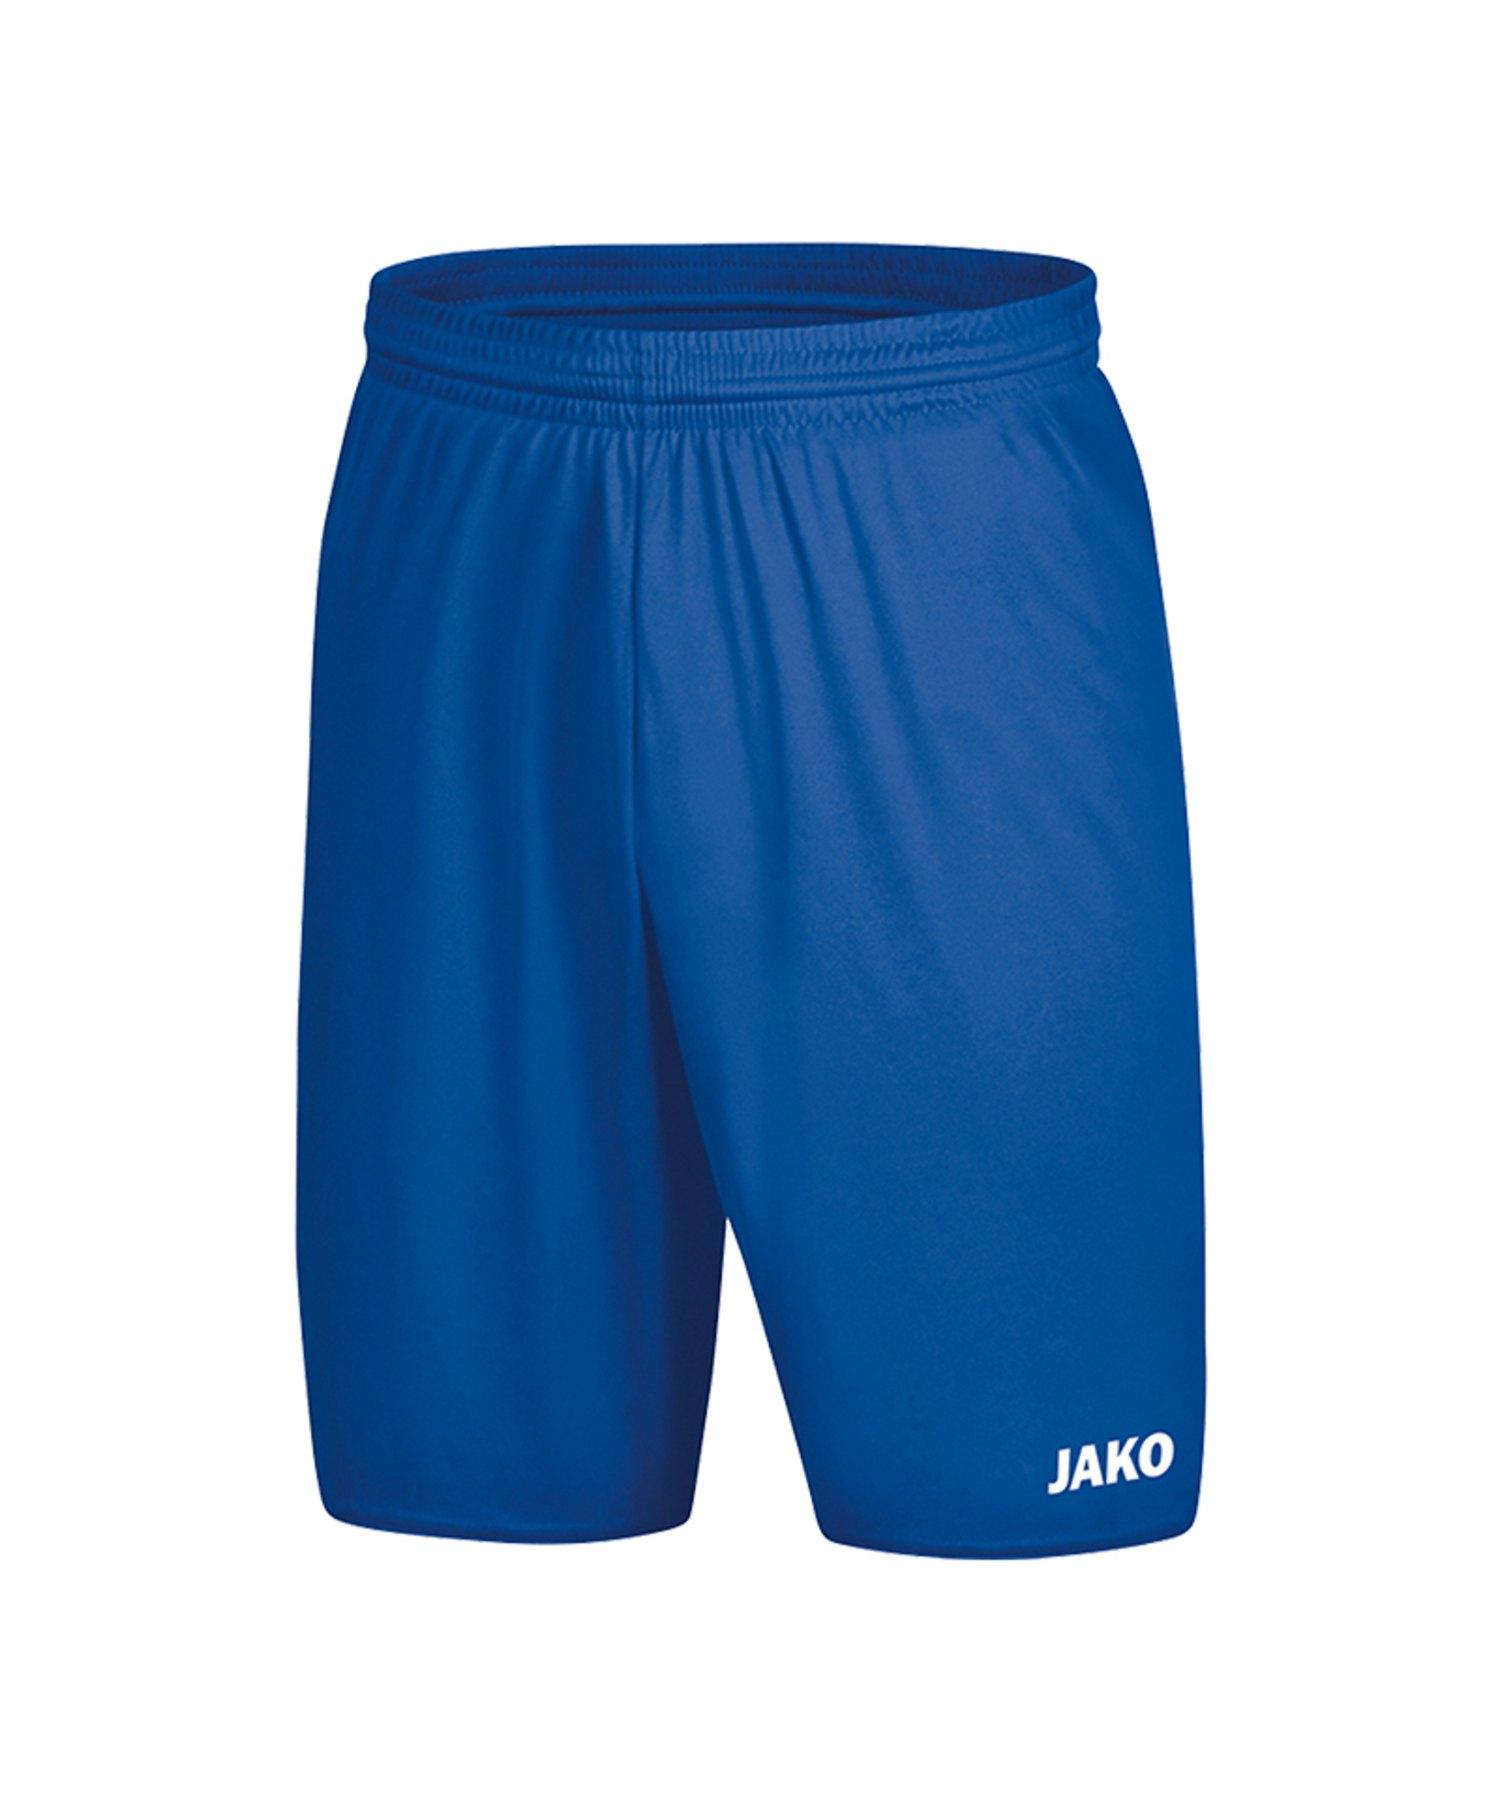 Jako Manchester 2.0 Short ohne Innenslip Blau F04 - Blau